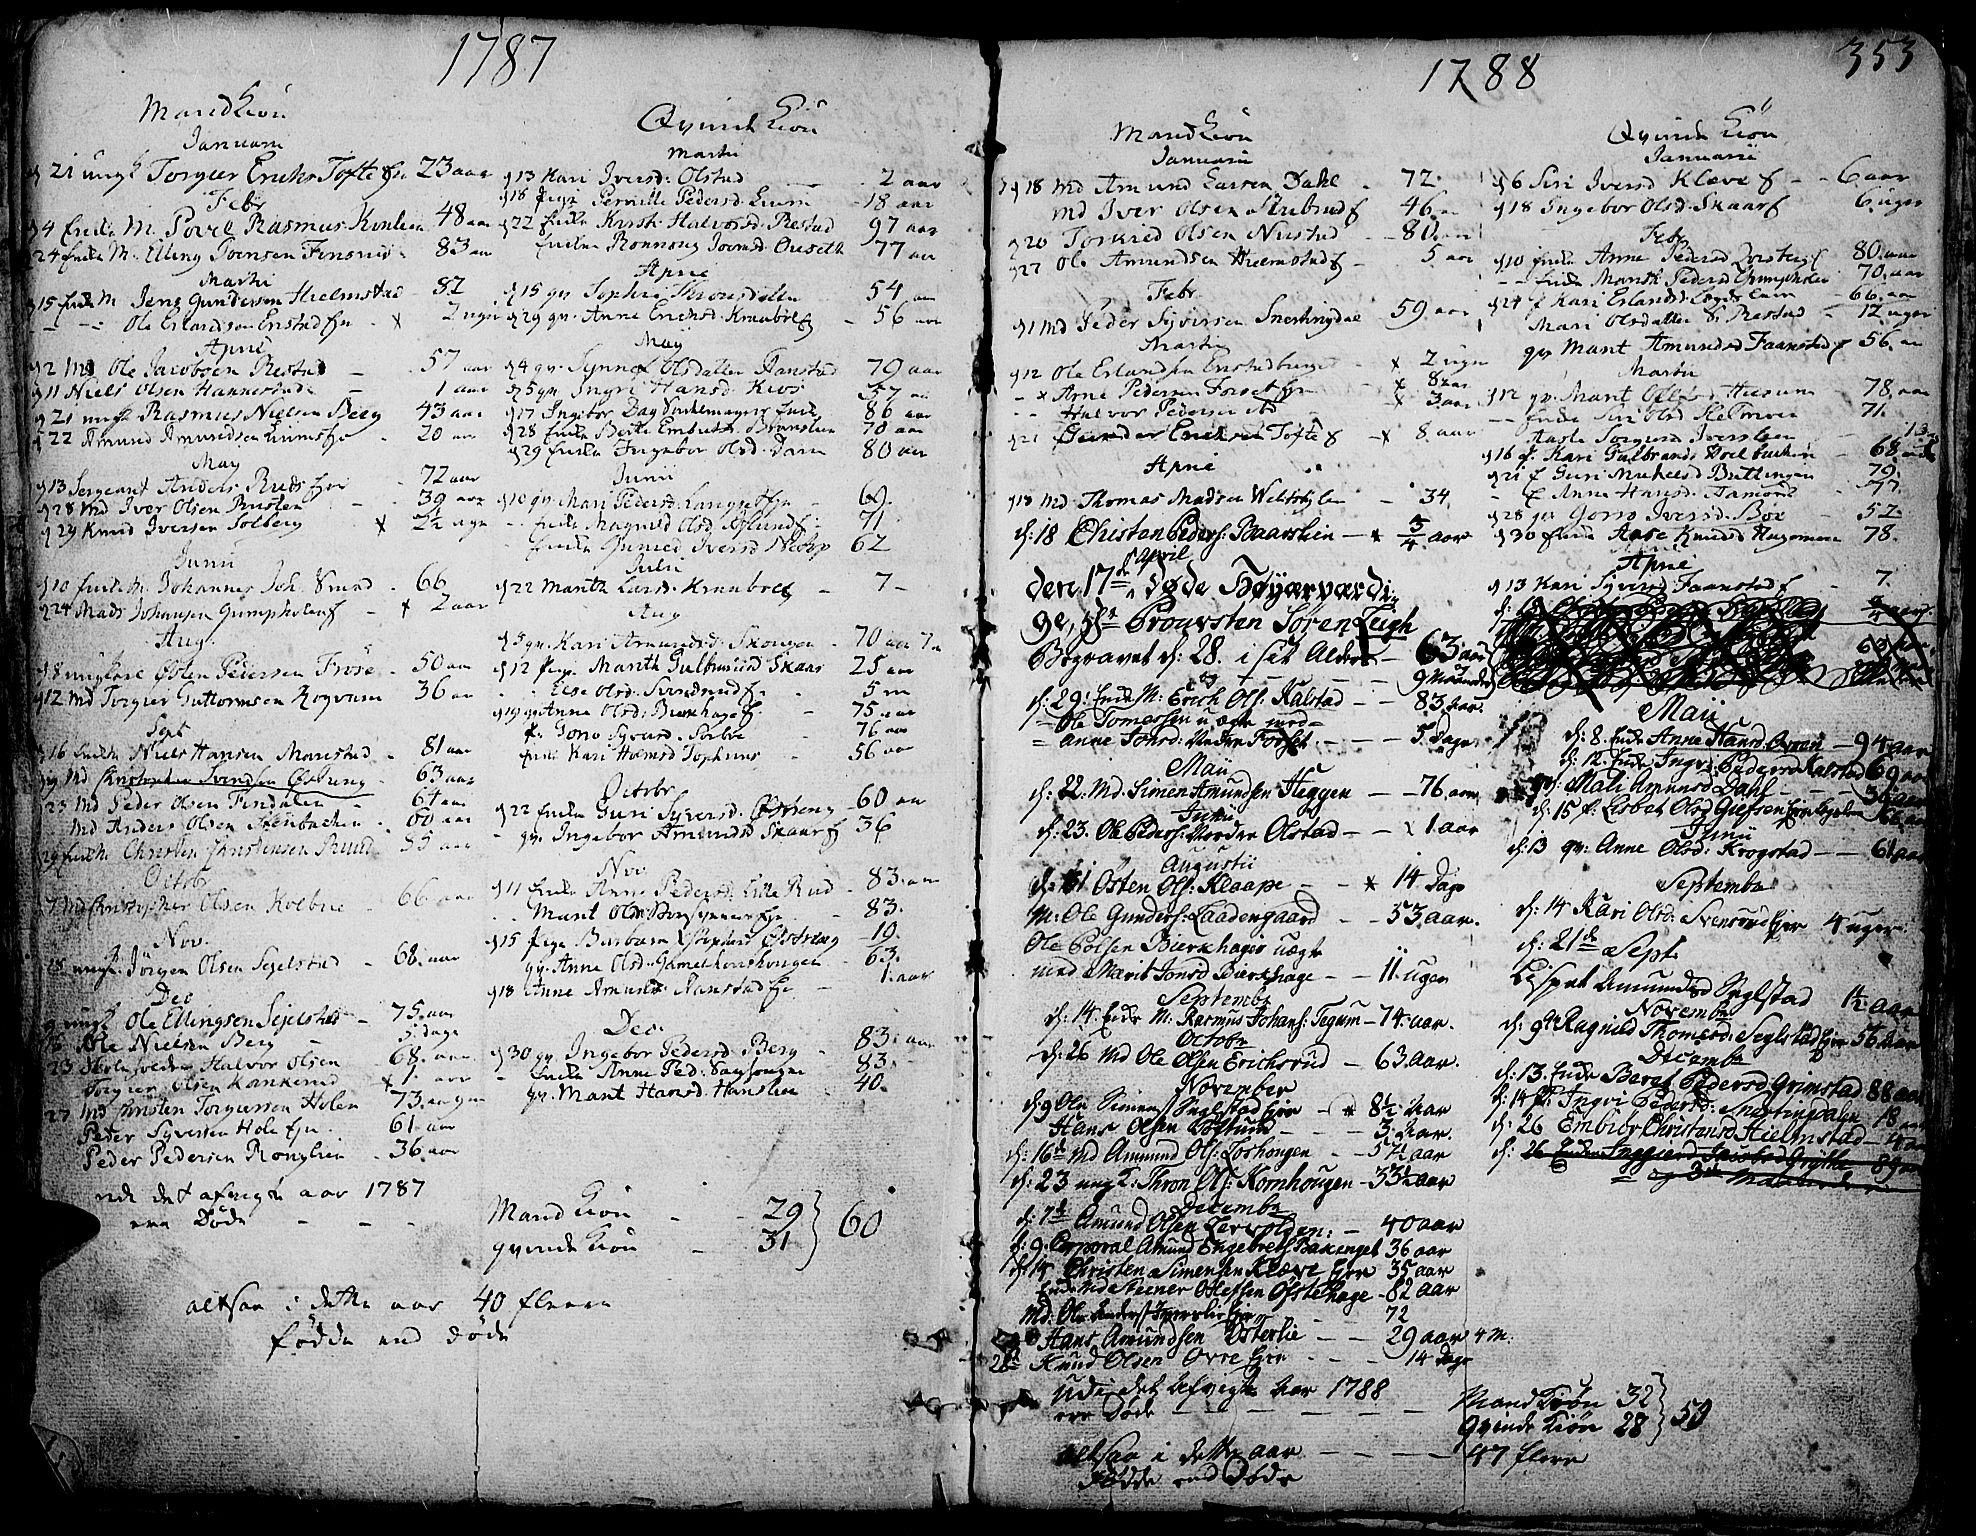 SAH, Gausdal prestekontor, Ministerialbok nr. 3, 1758-1809, s. 353